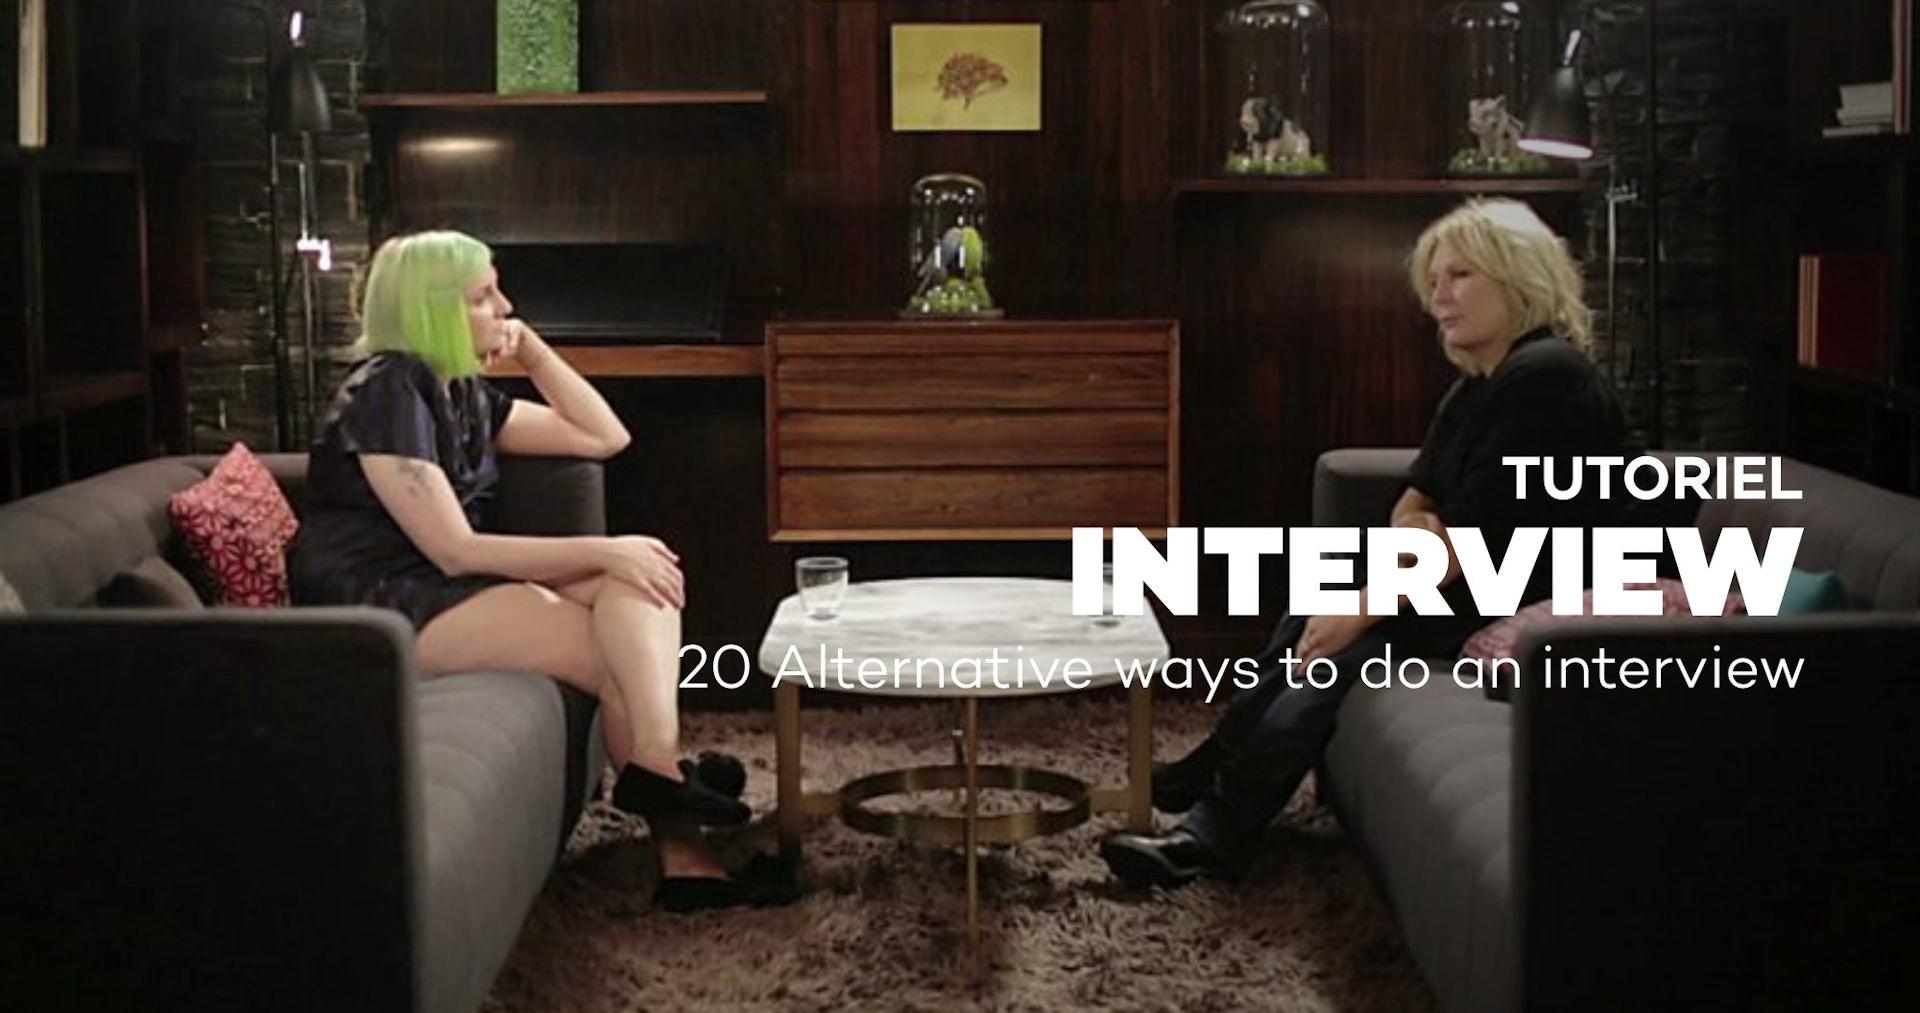 20 ALTERNATIVE WAYS TO DO AN INTERVIEW